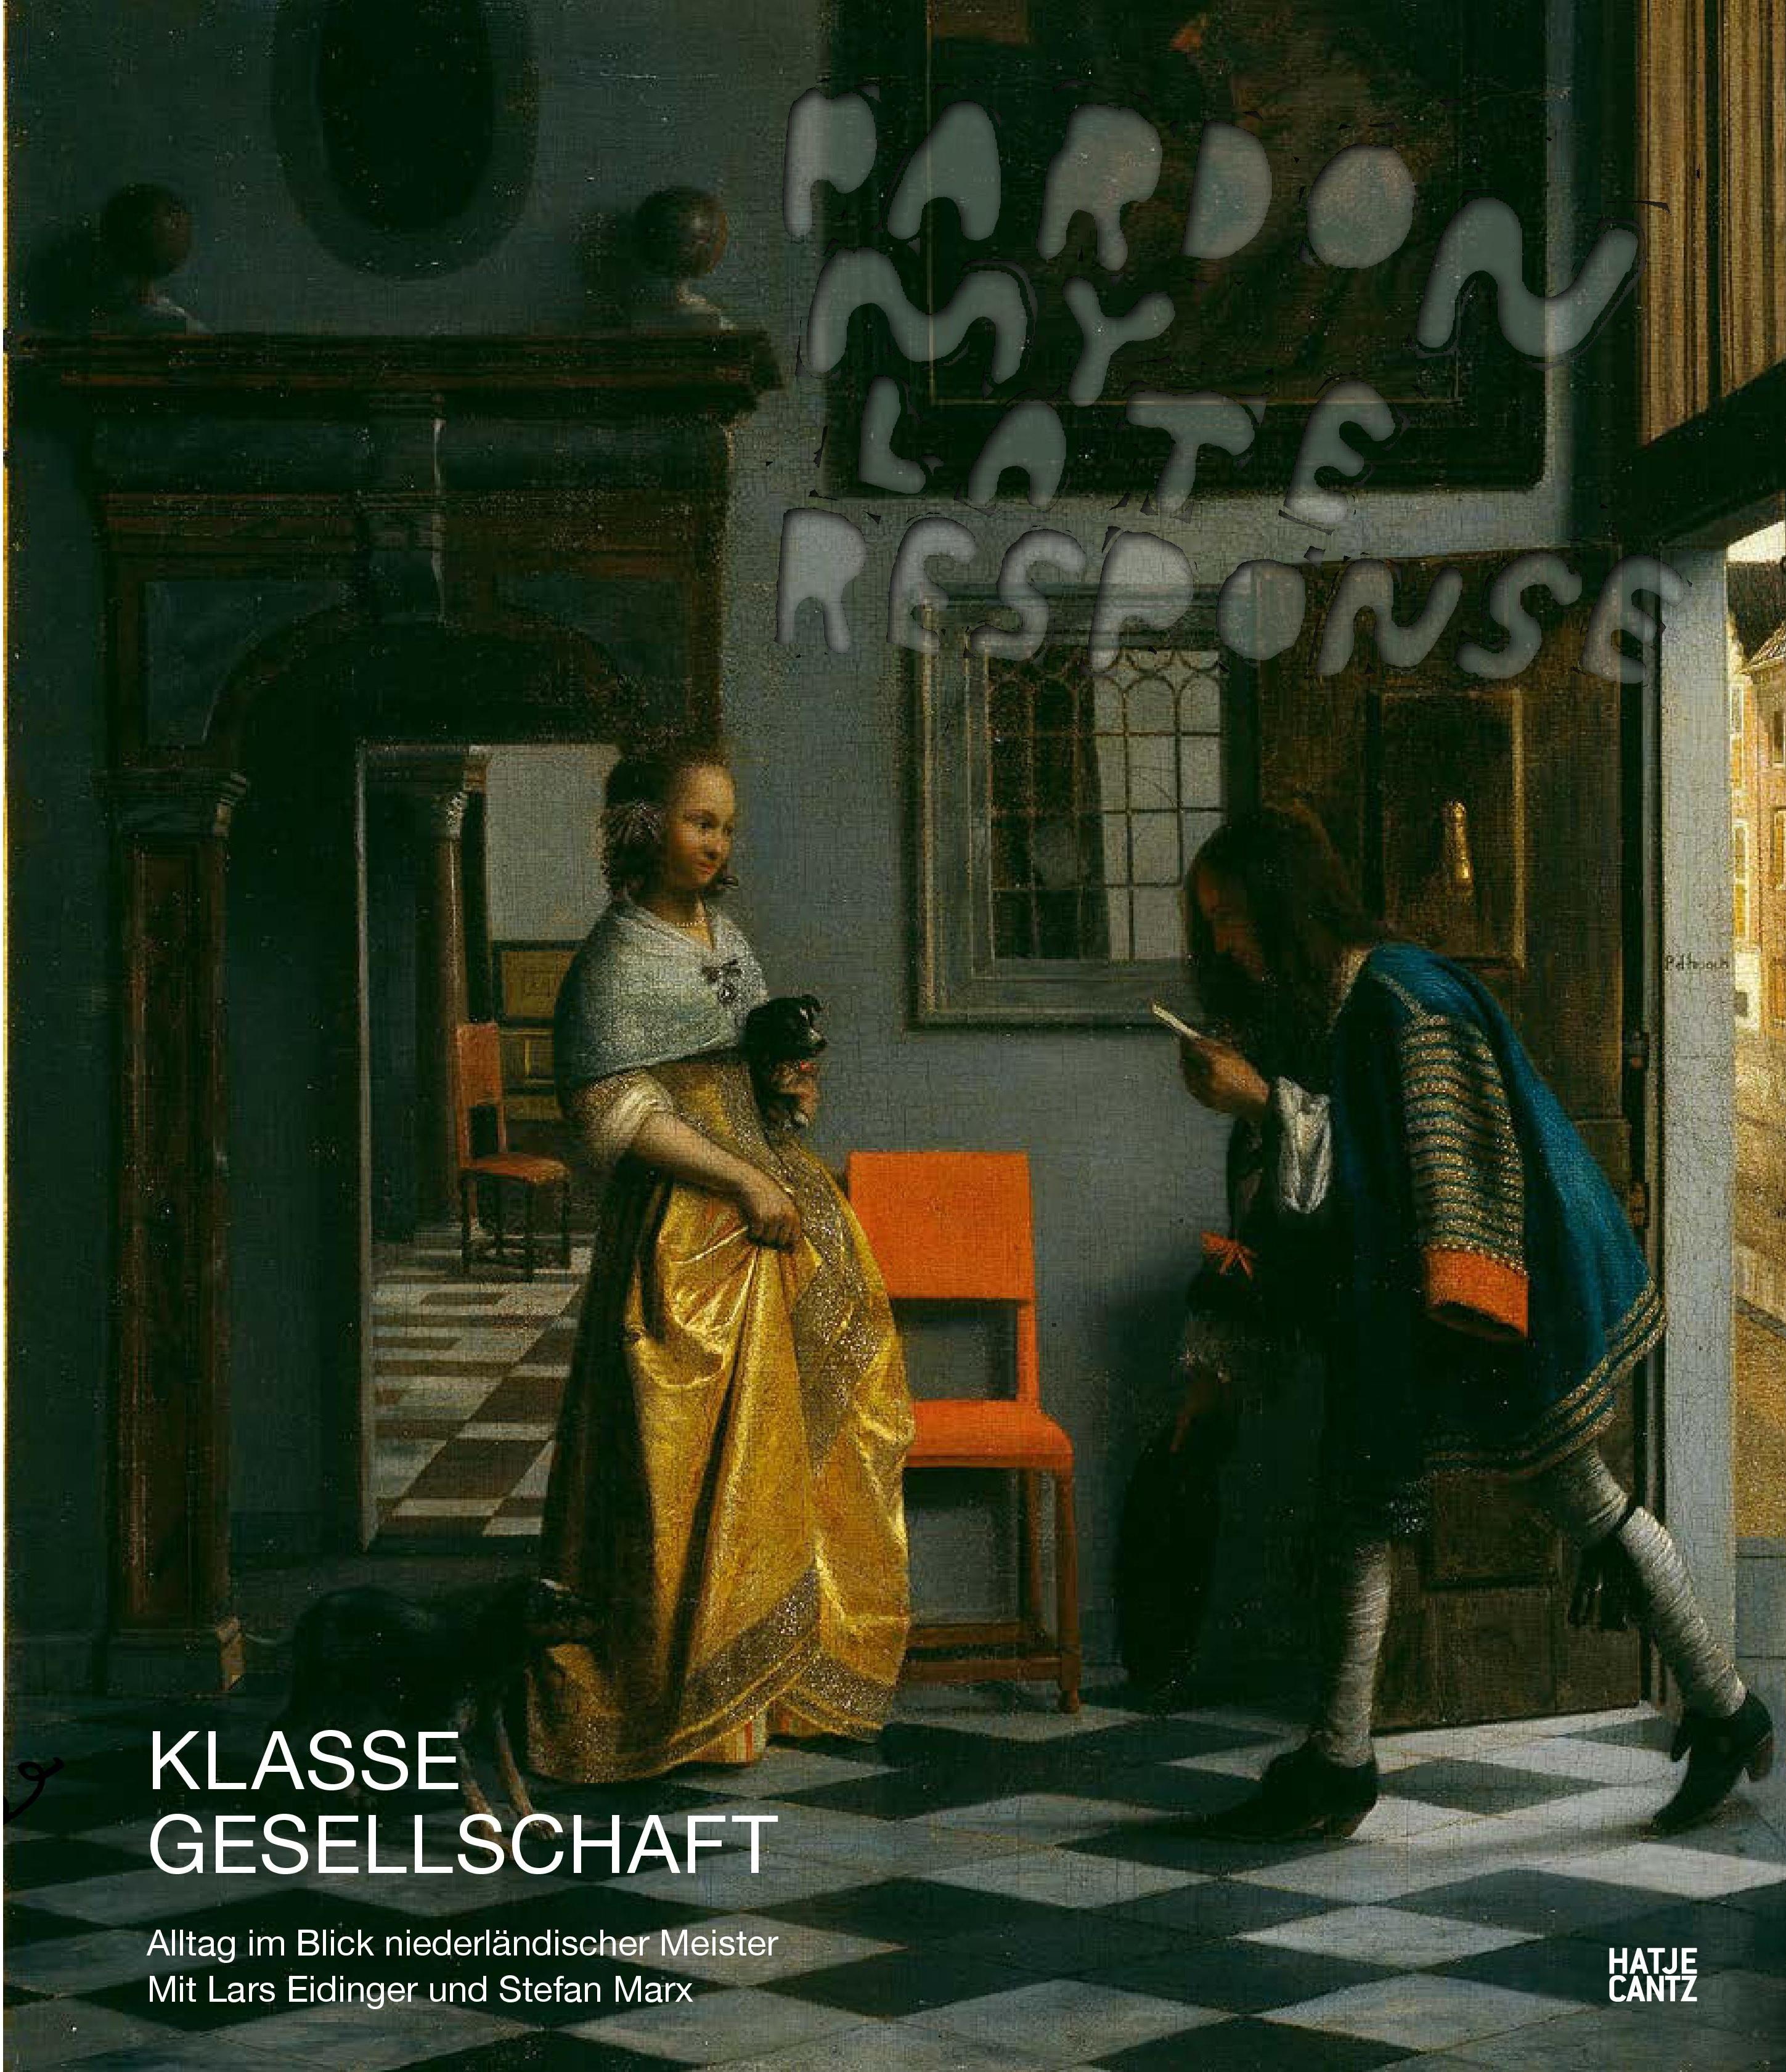 Katalogcover zur Ausstellung Klasse Gesellschaft Hamburger Kunsthalle, Hatje Cantz Verlag 2021